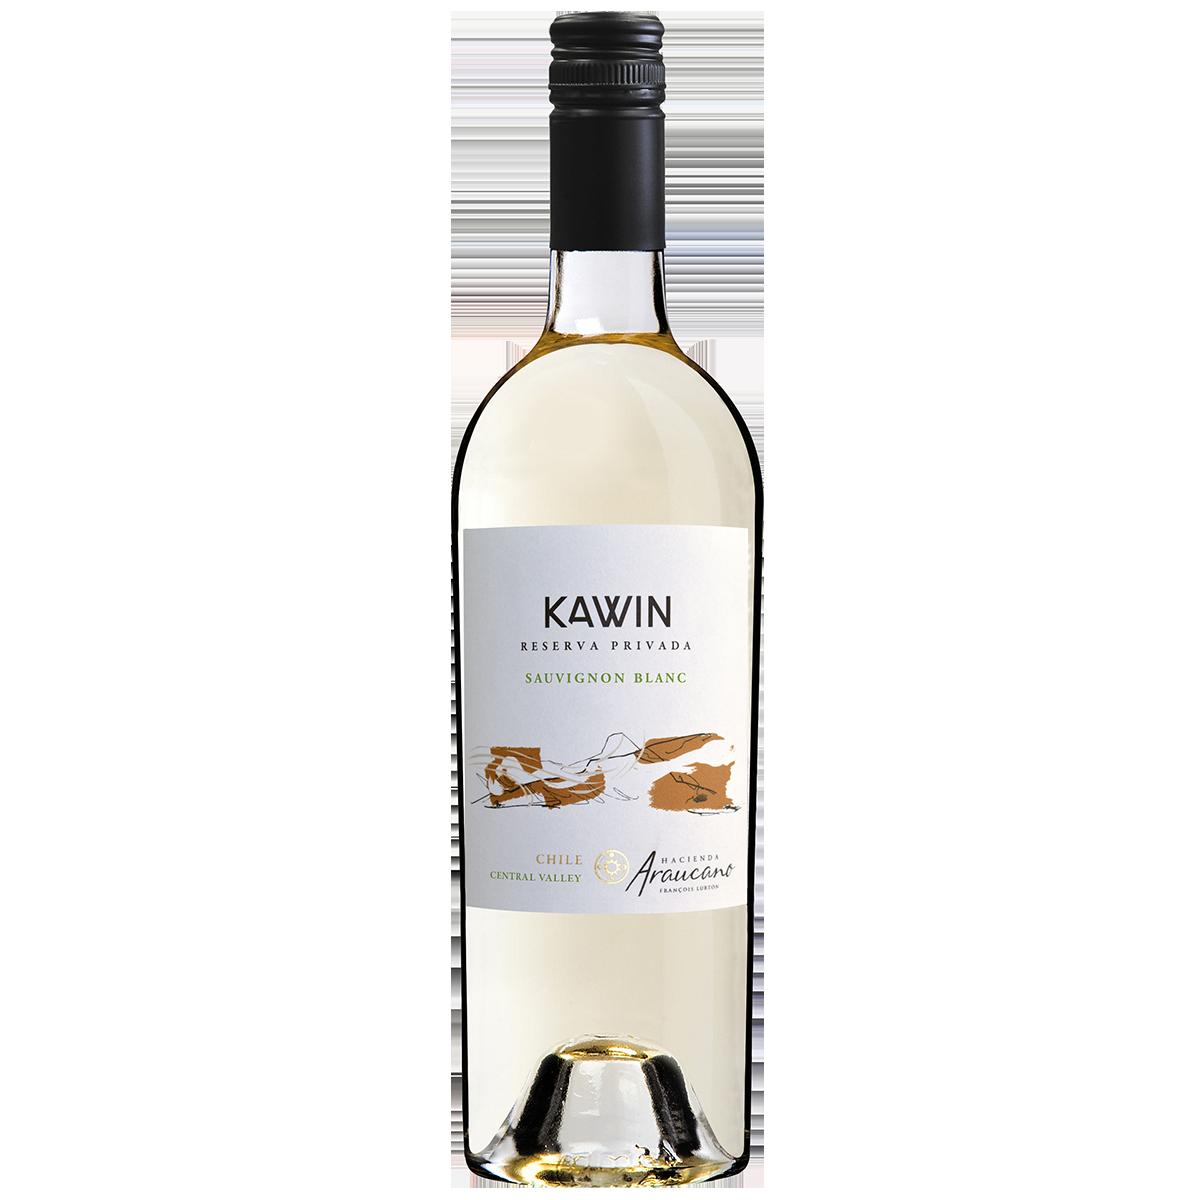 CHL2101 智利魯頓谷人莊園凱因白蘇維濃陳年珍釀白葡萄酒 Hacienda Araucano Kawin Reserva Privada Sauvignon Blanc, Central Valley (750ML)